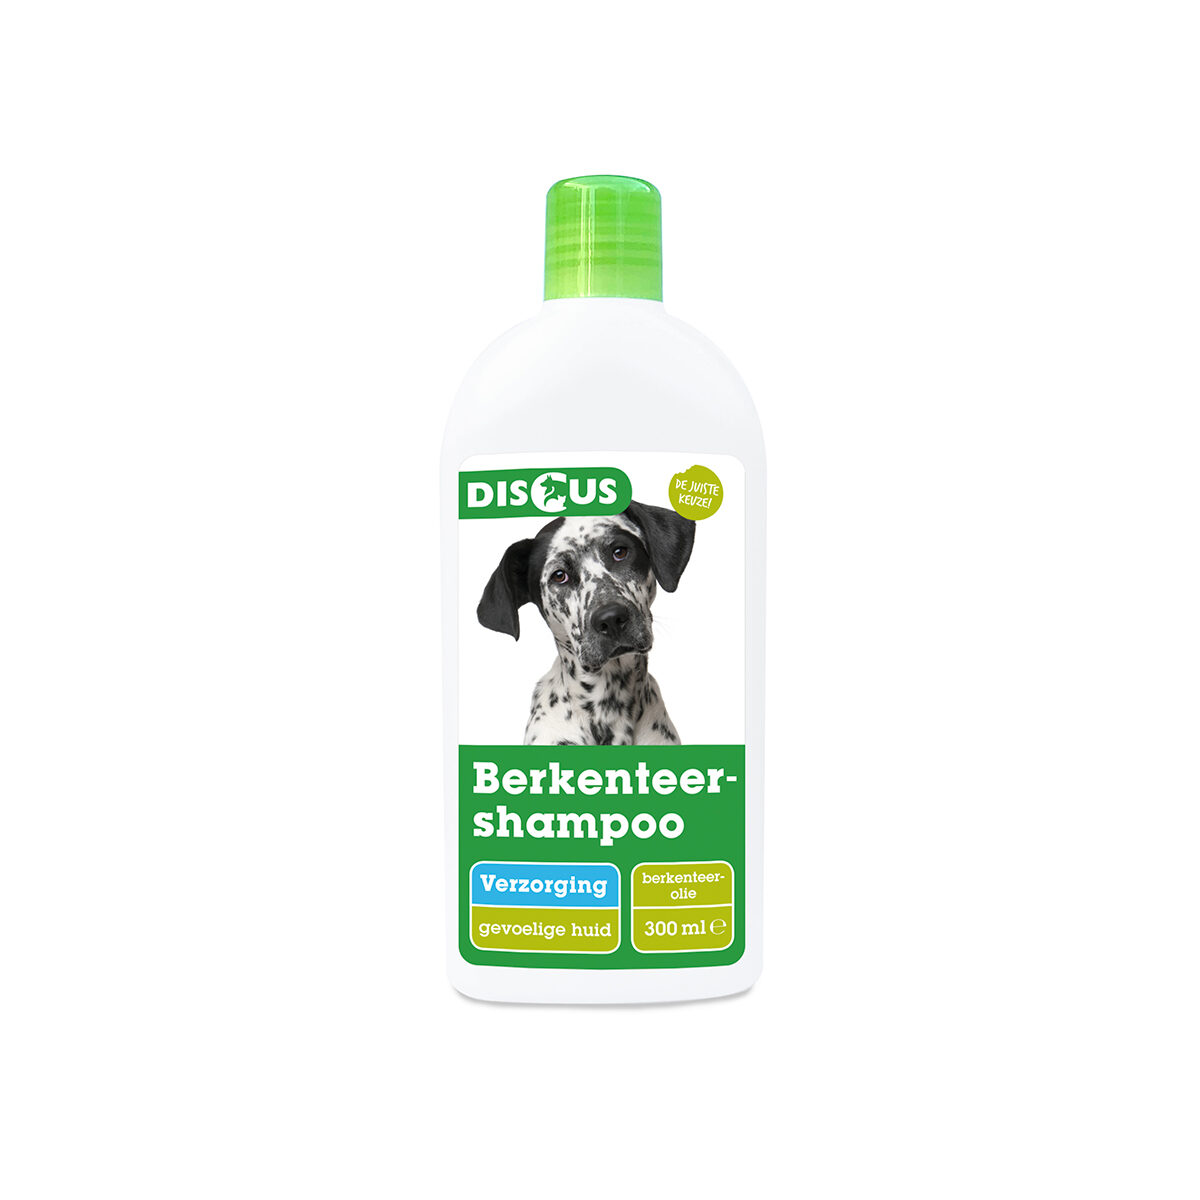 Discus Berkenteer Shampoo 300 ml